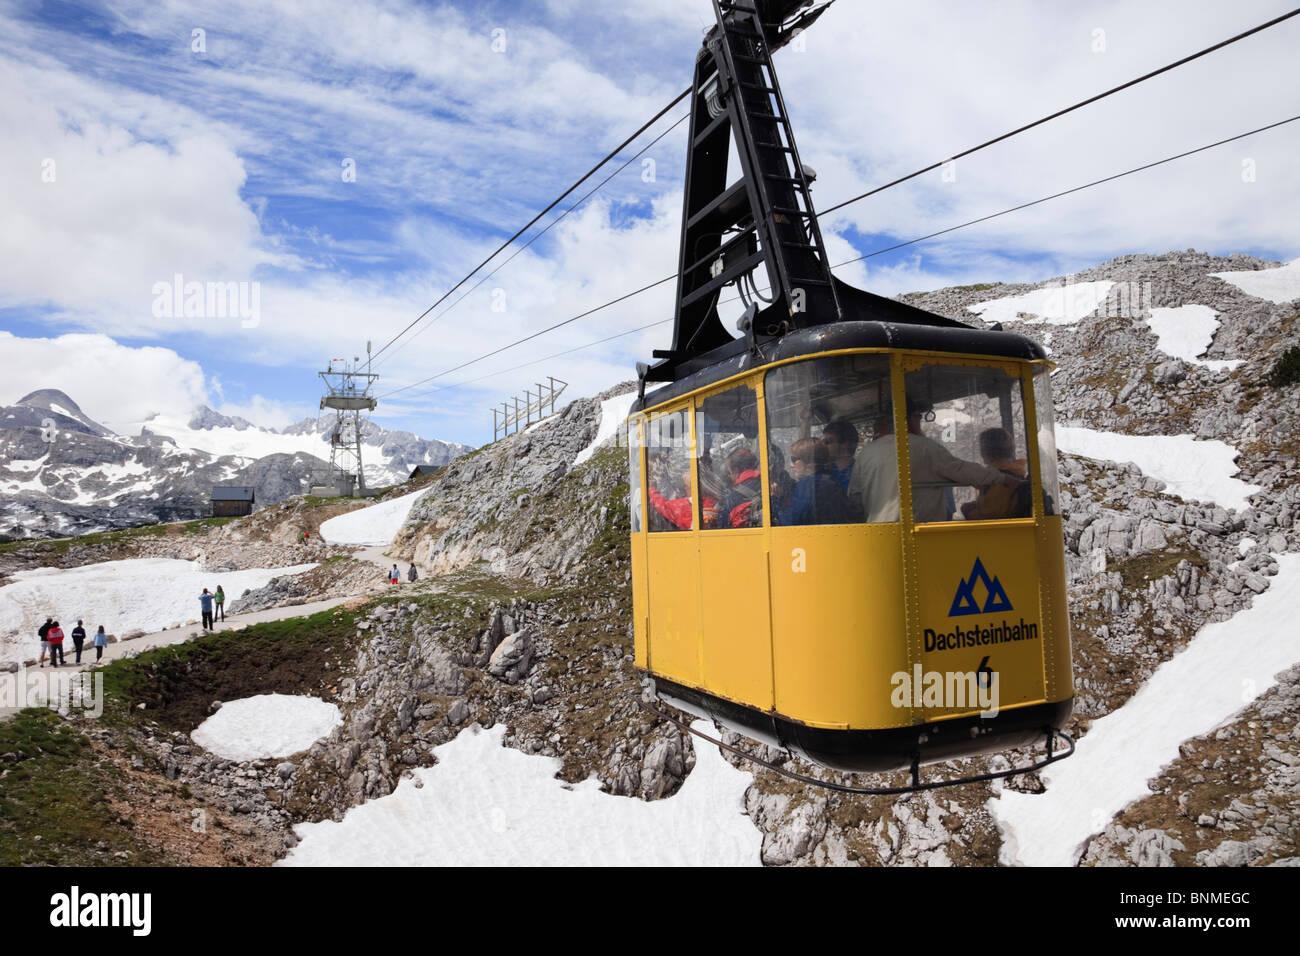 Dachstein World Heritage Cableway cablecar on Krippenstein mountain in the Dachstein Massif in summer. Obertraun, - Stock Image